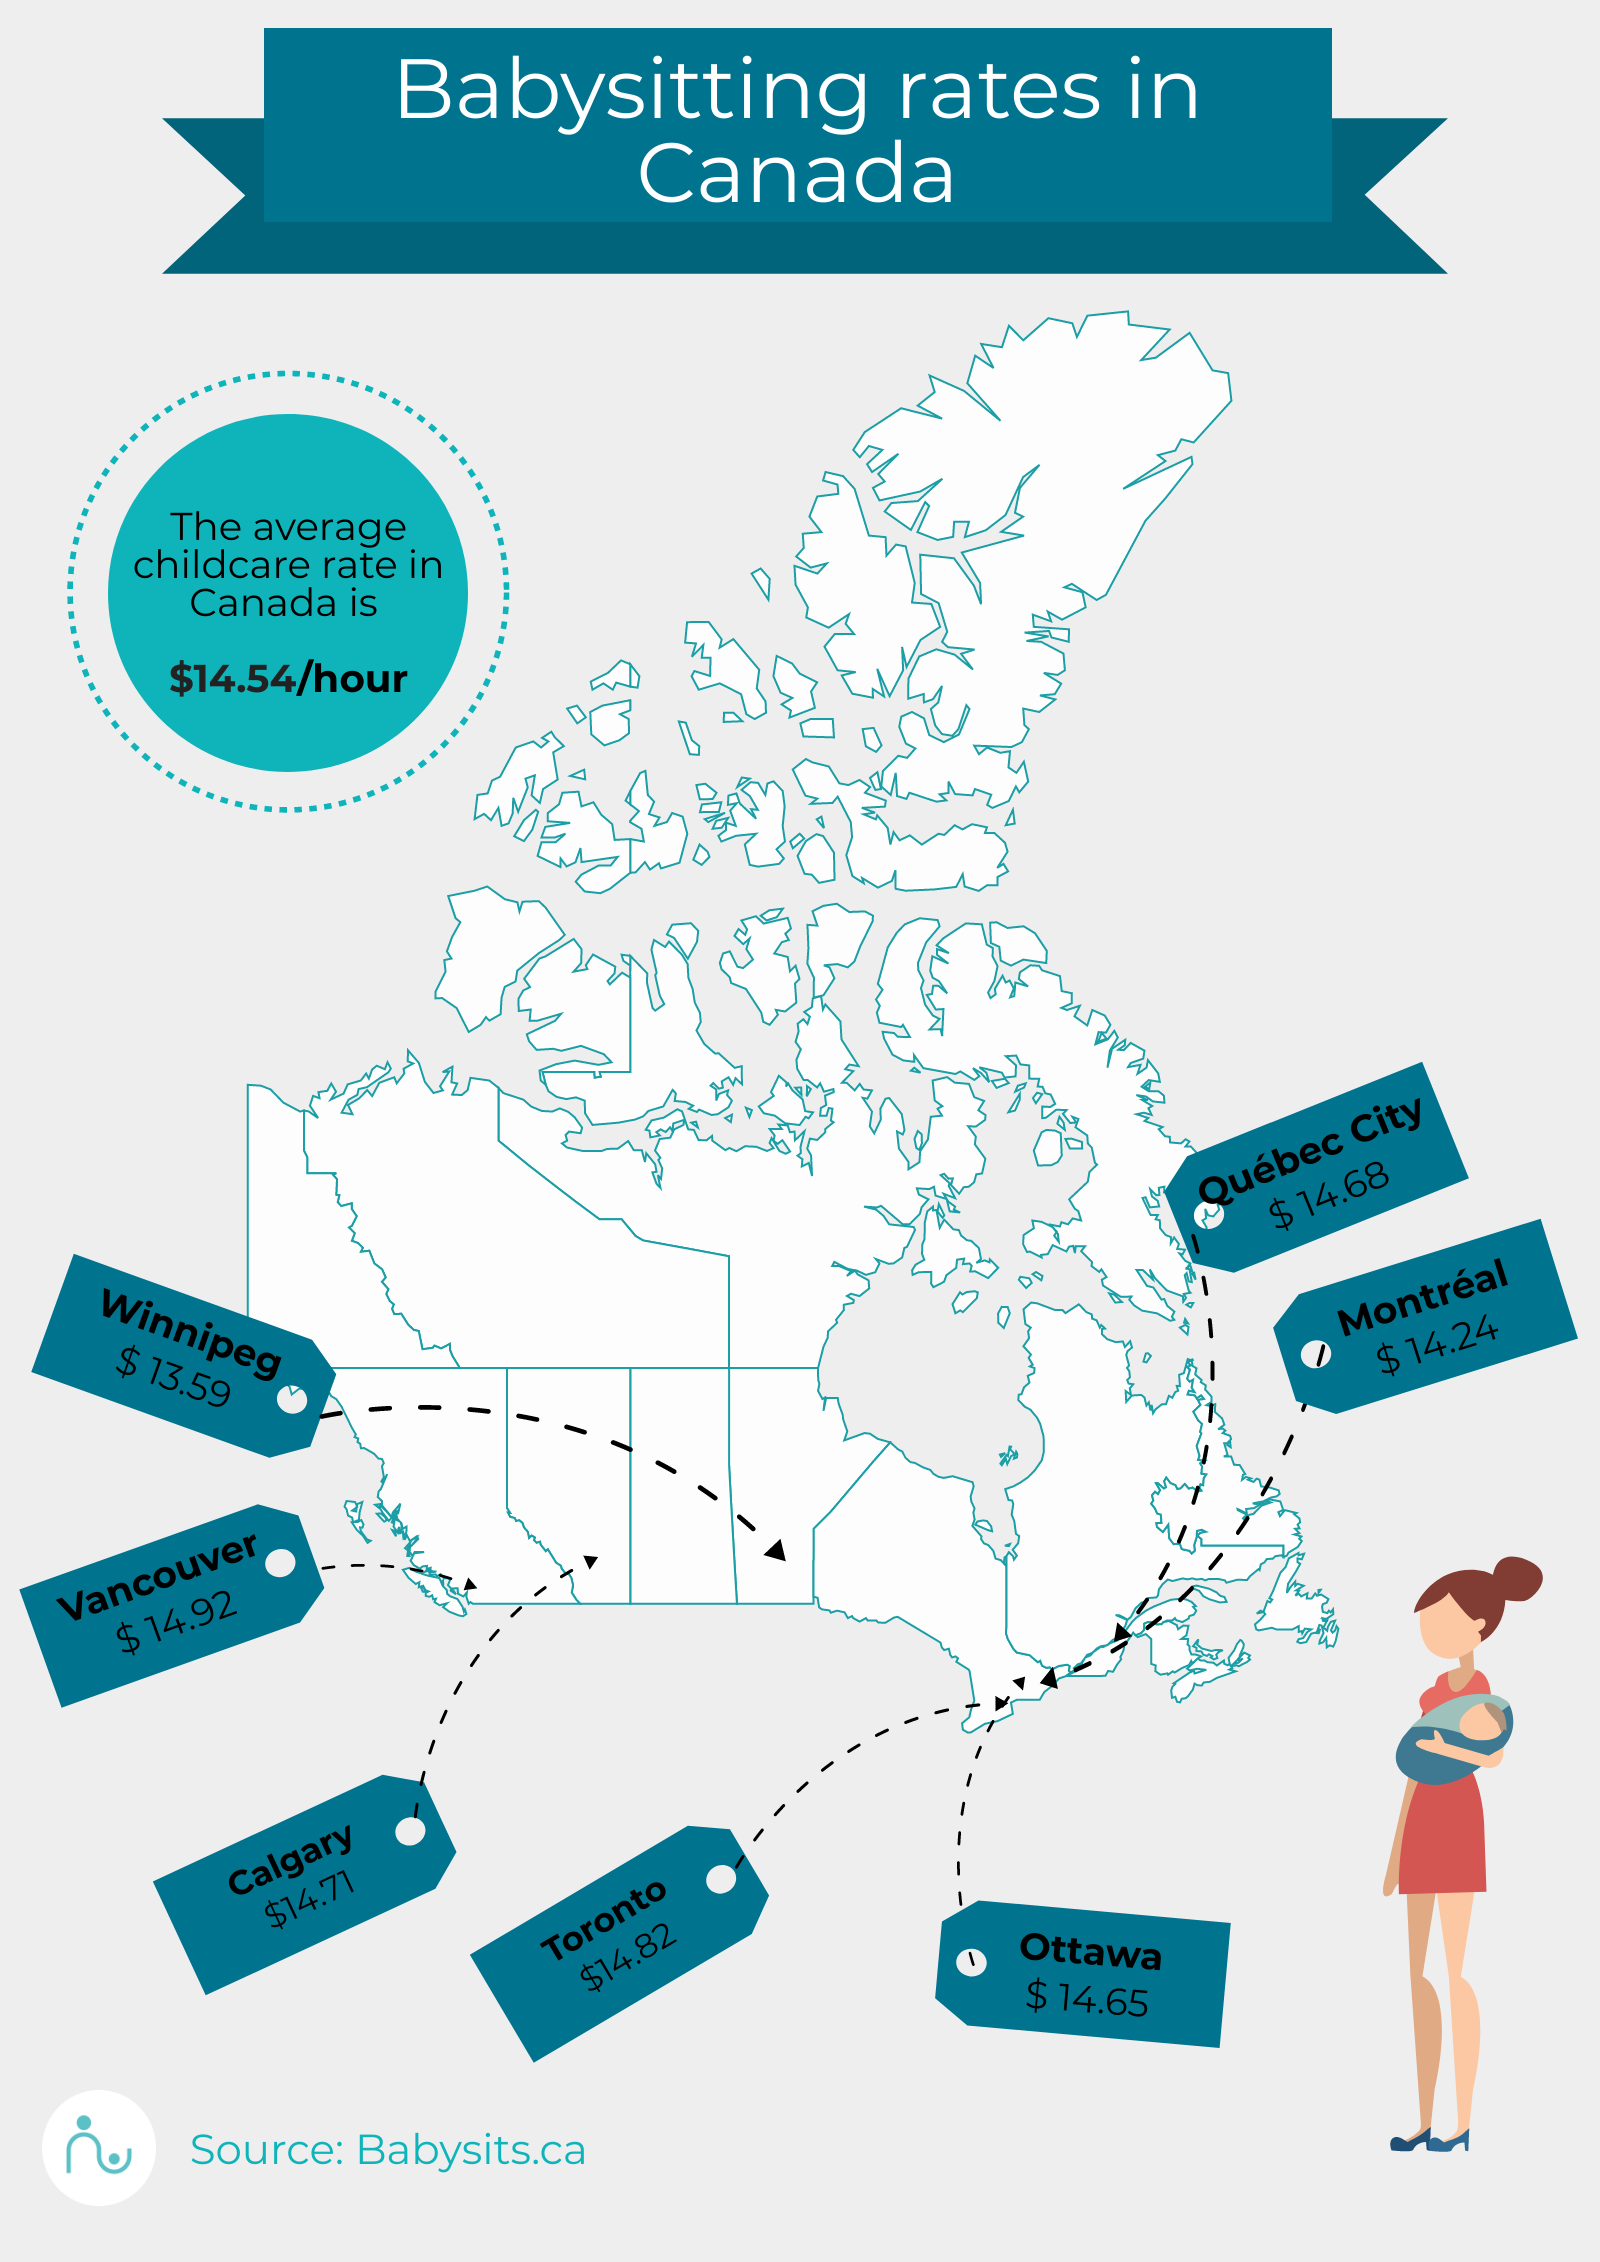 Average babysitting rate in Canada